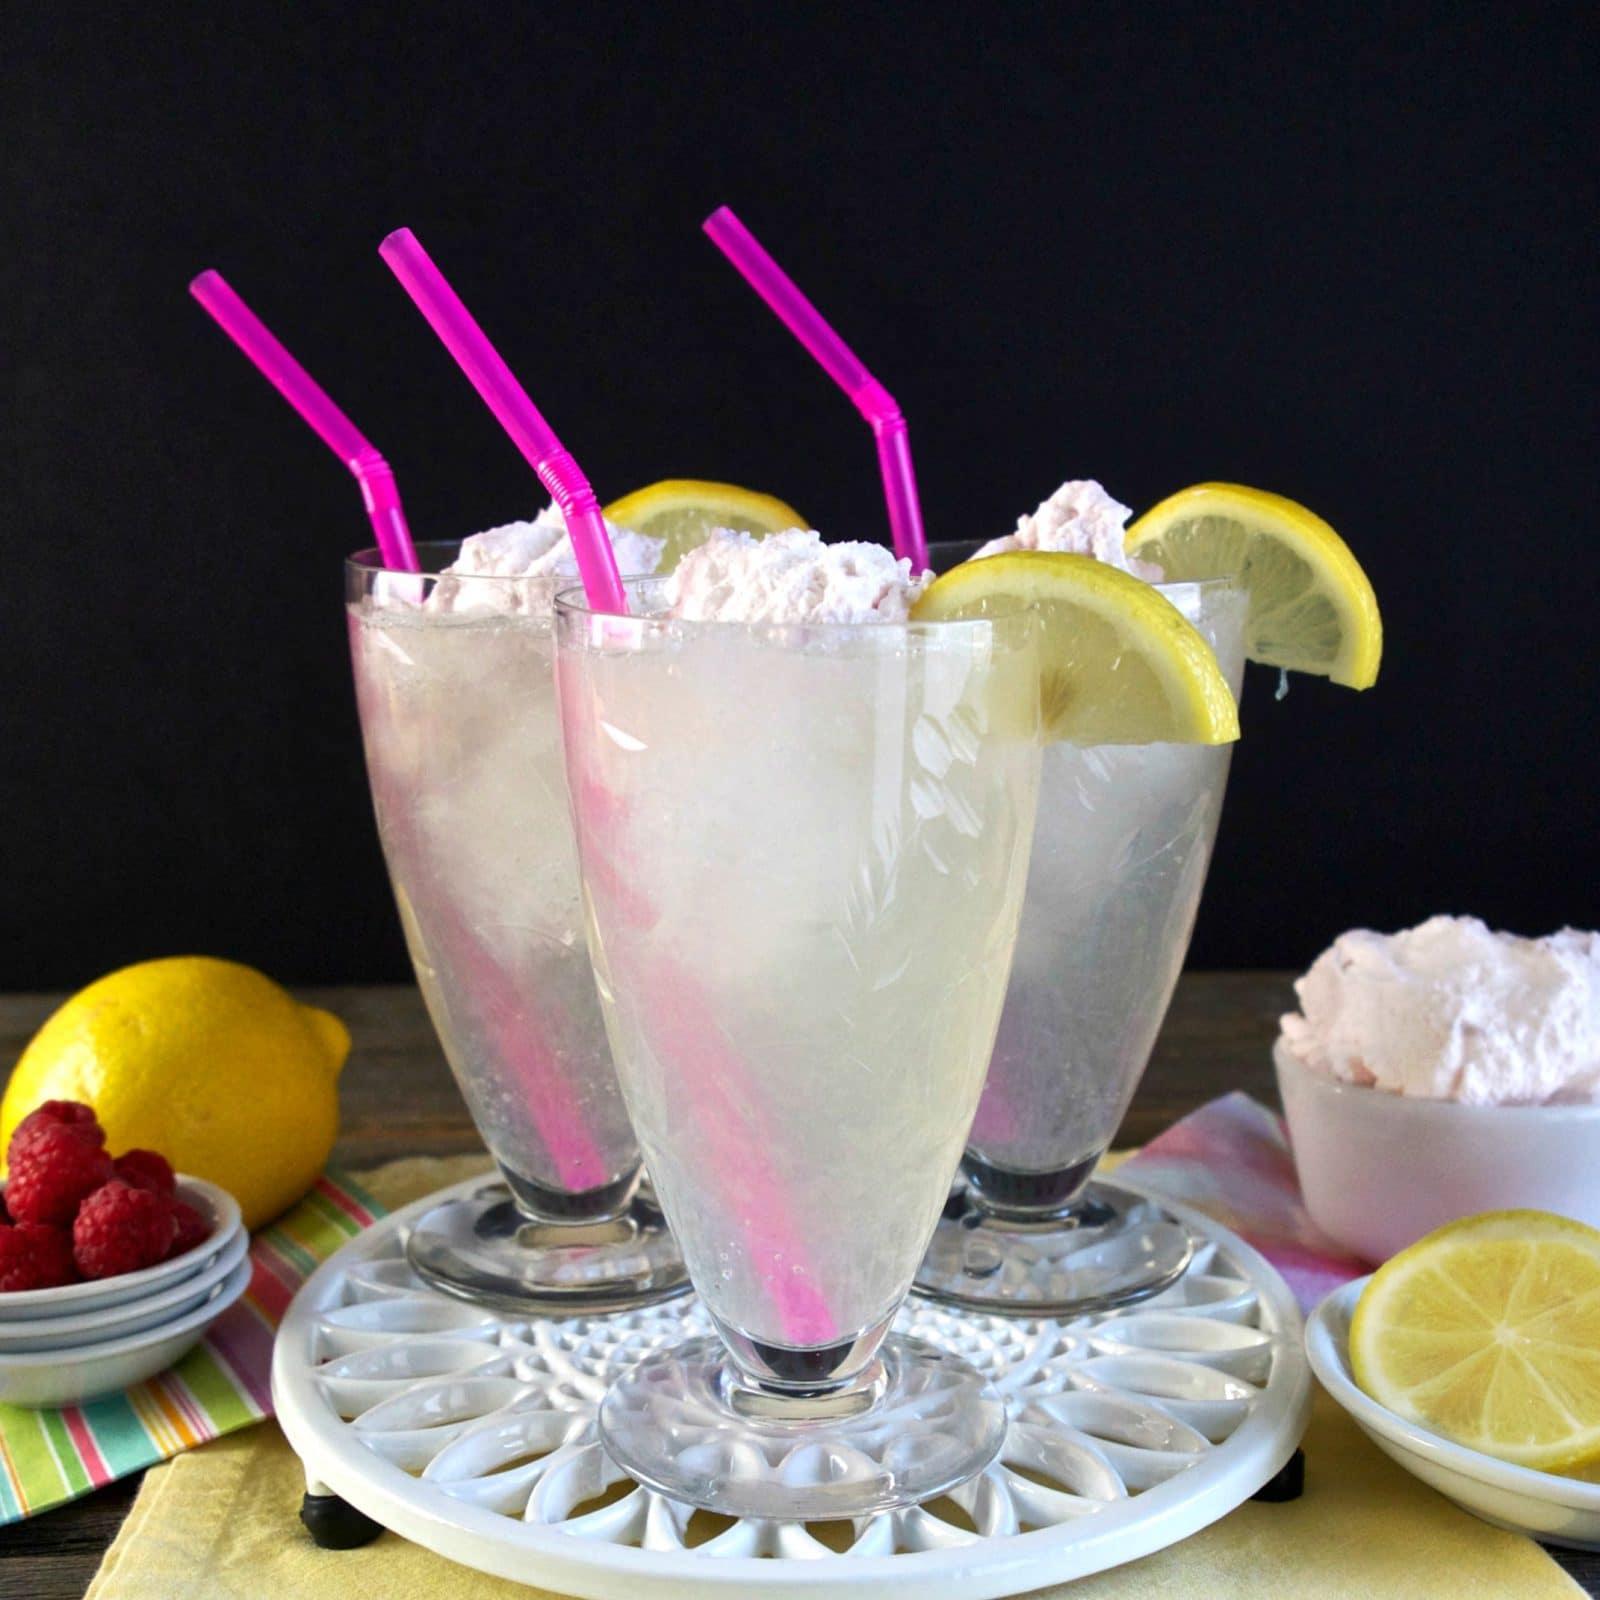 Homemade Lemonade with Raspberry Cream